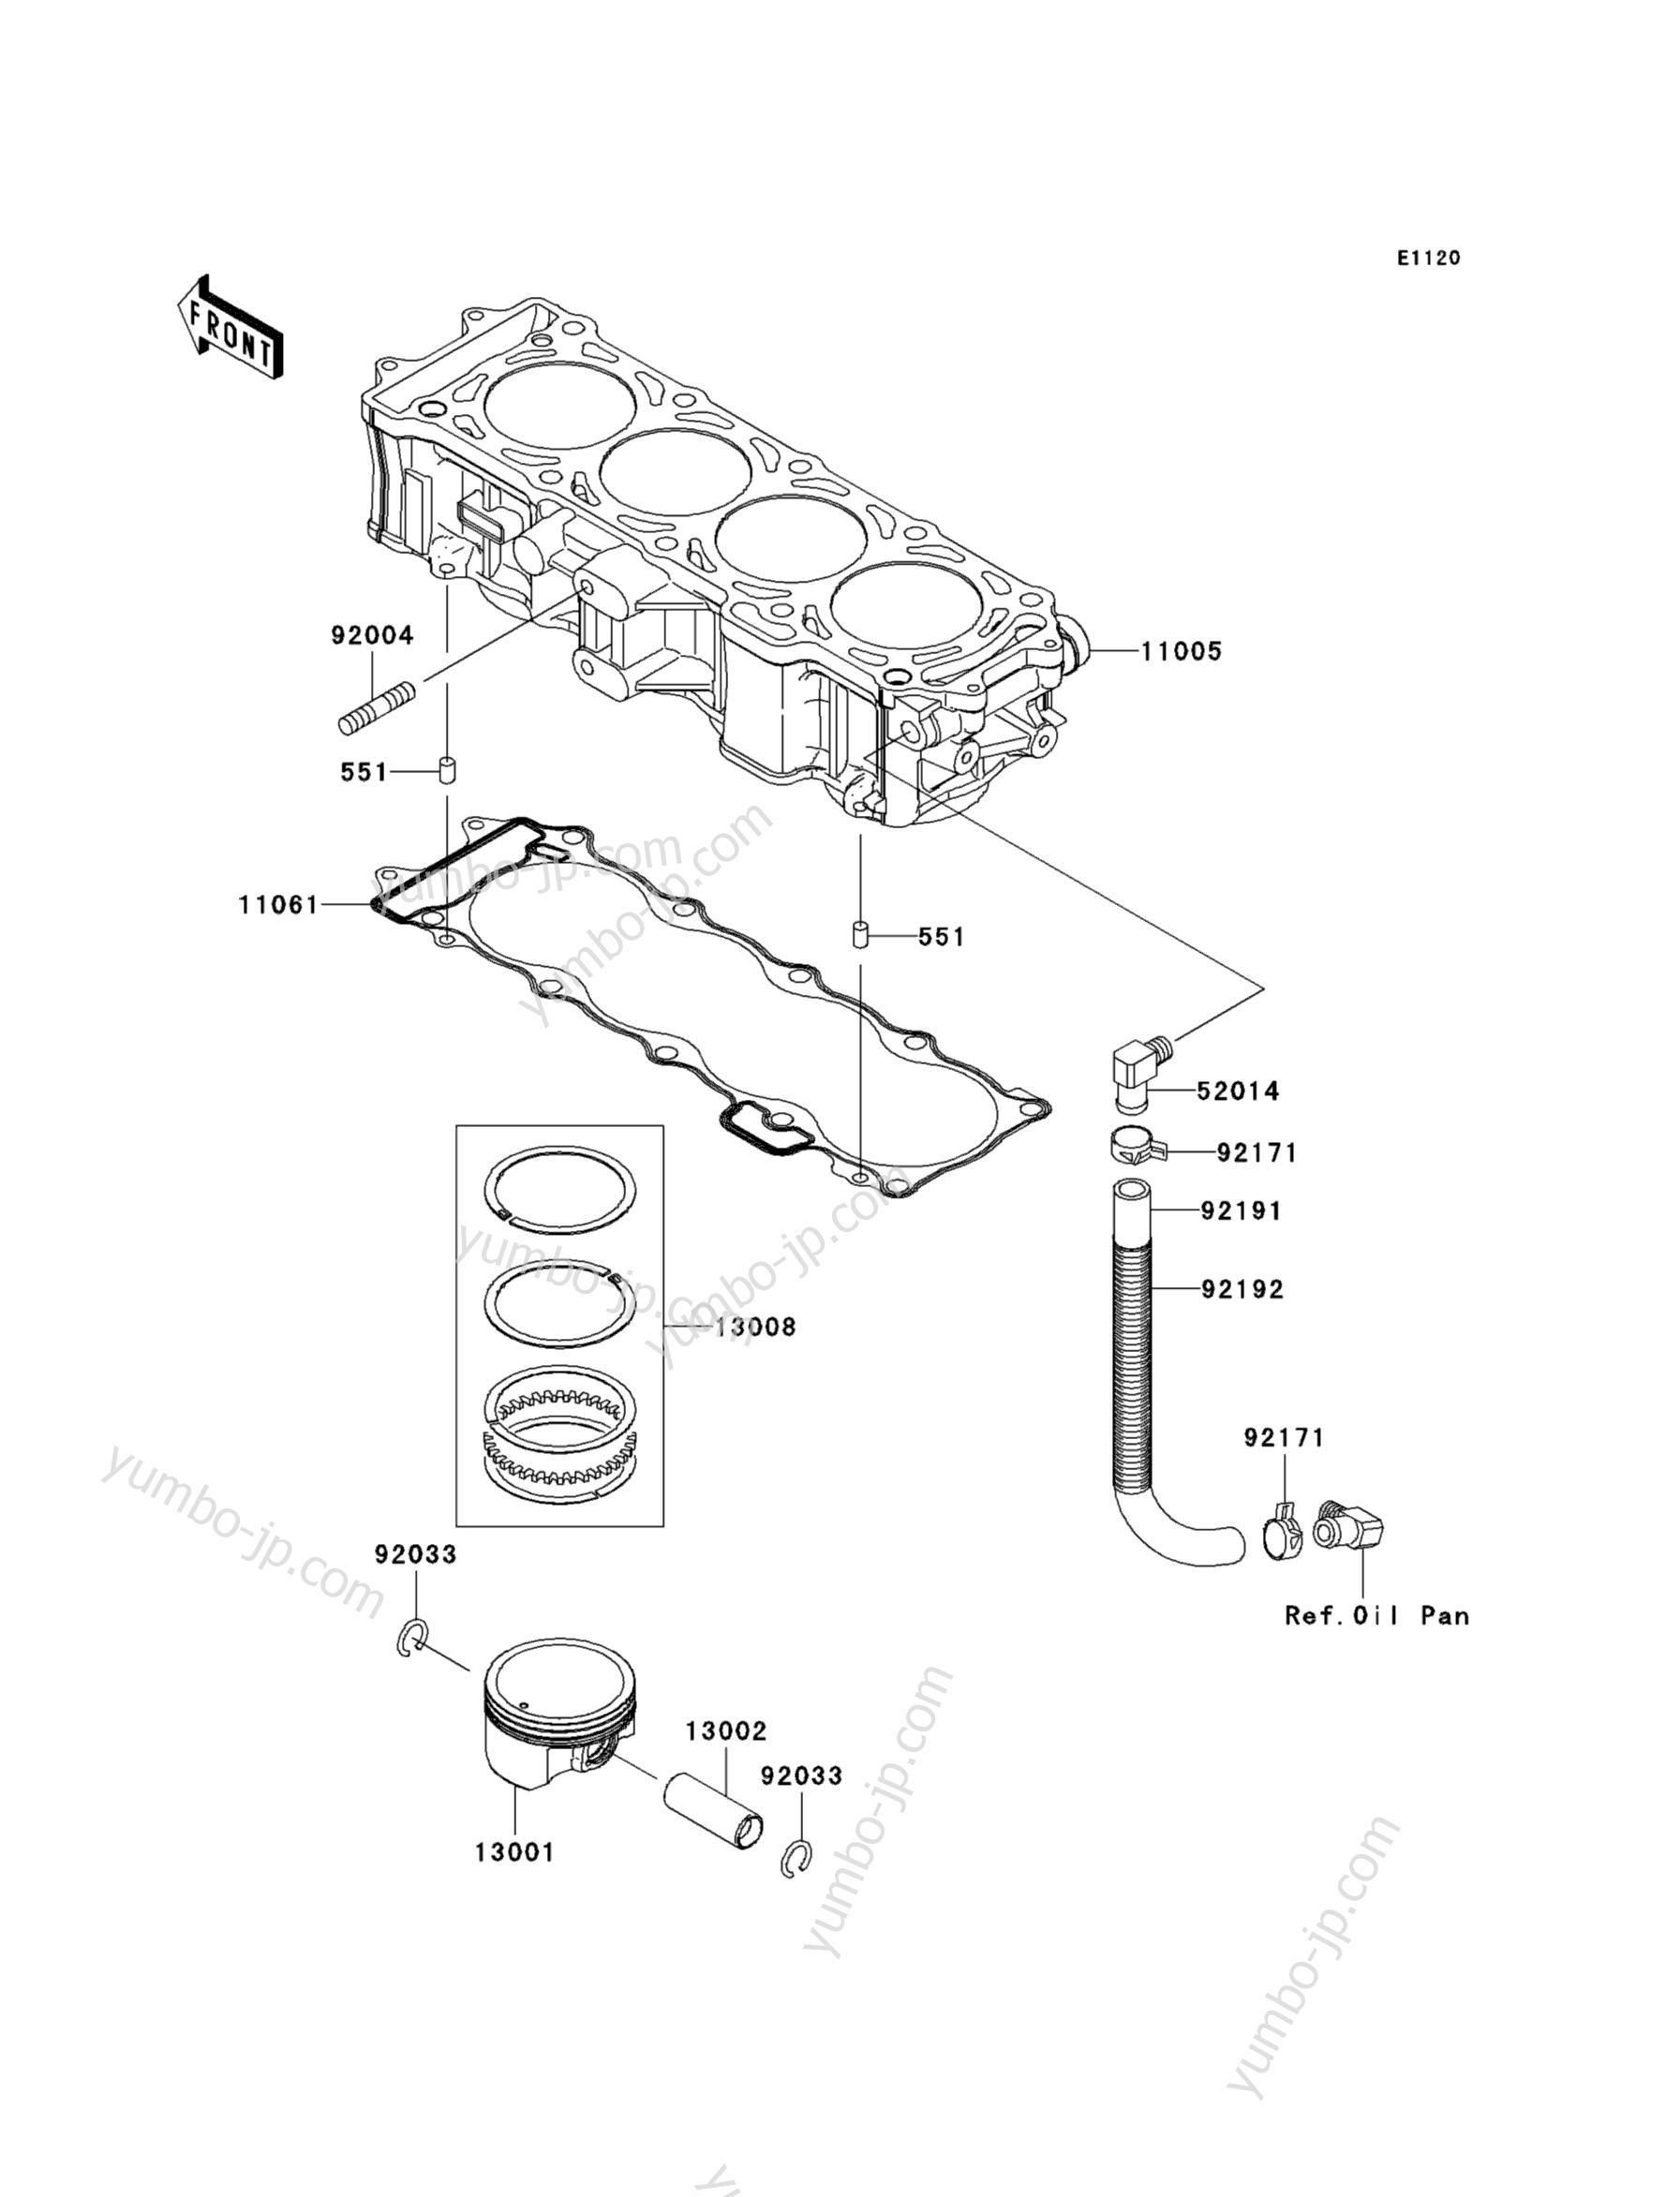 Cylinder/Piston(s) для гидроцикла KAWASAKI JET SKI ULTRA 300X (JT1500HCF) 2012 г.